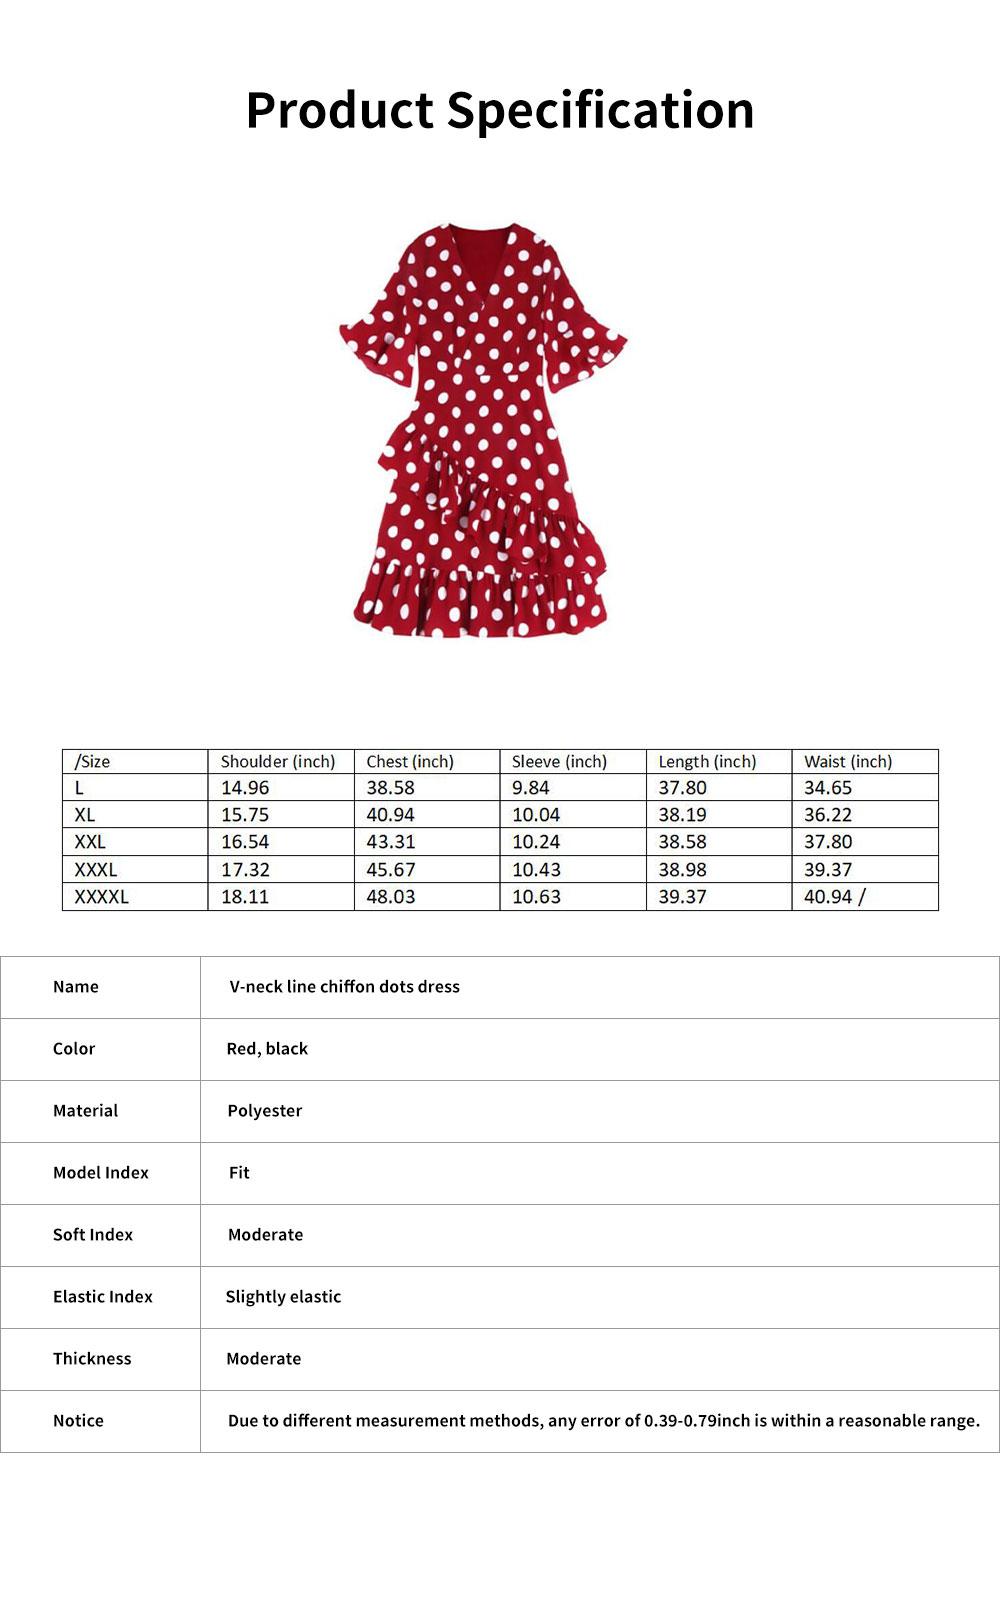 Elegant Fancy Dots Decorative V-Neck Line Dress Slim Fit Model Chiffon Lacing Dress with Falbala Sleeves 6